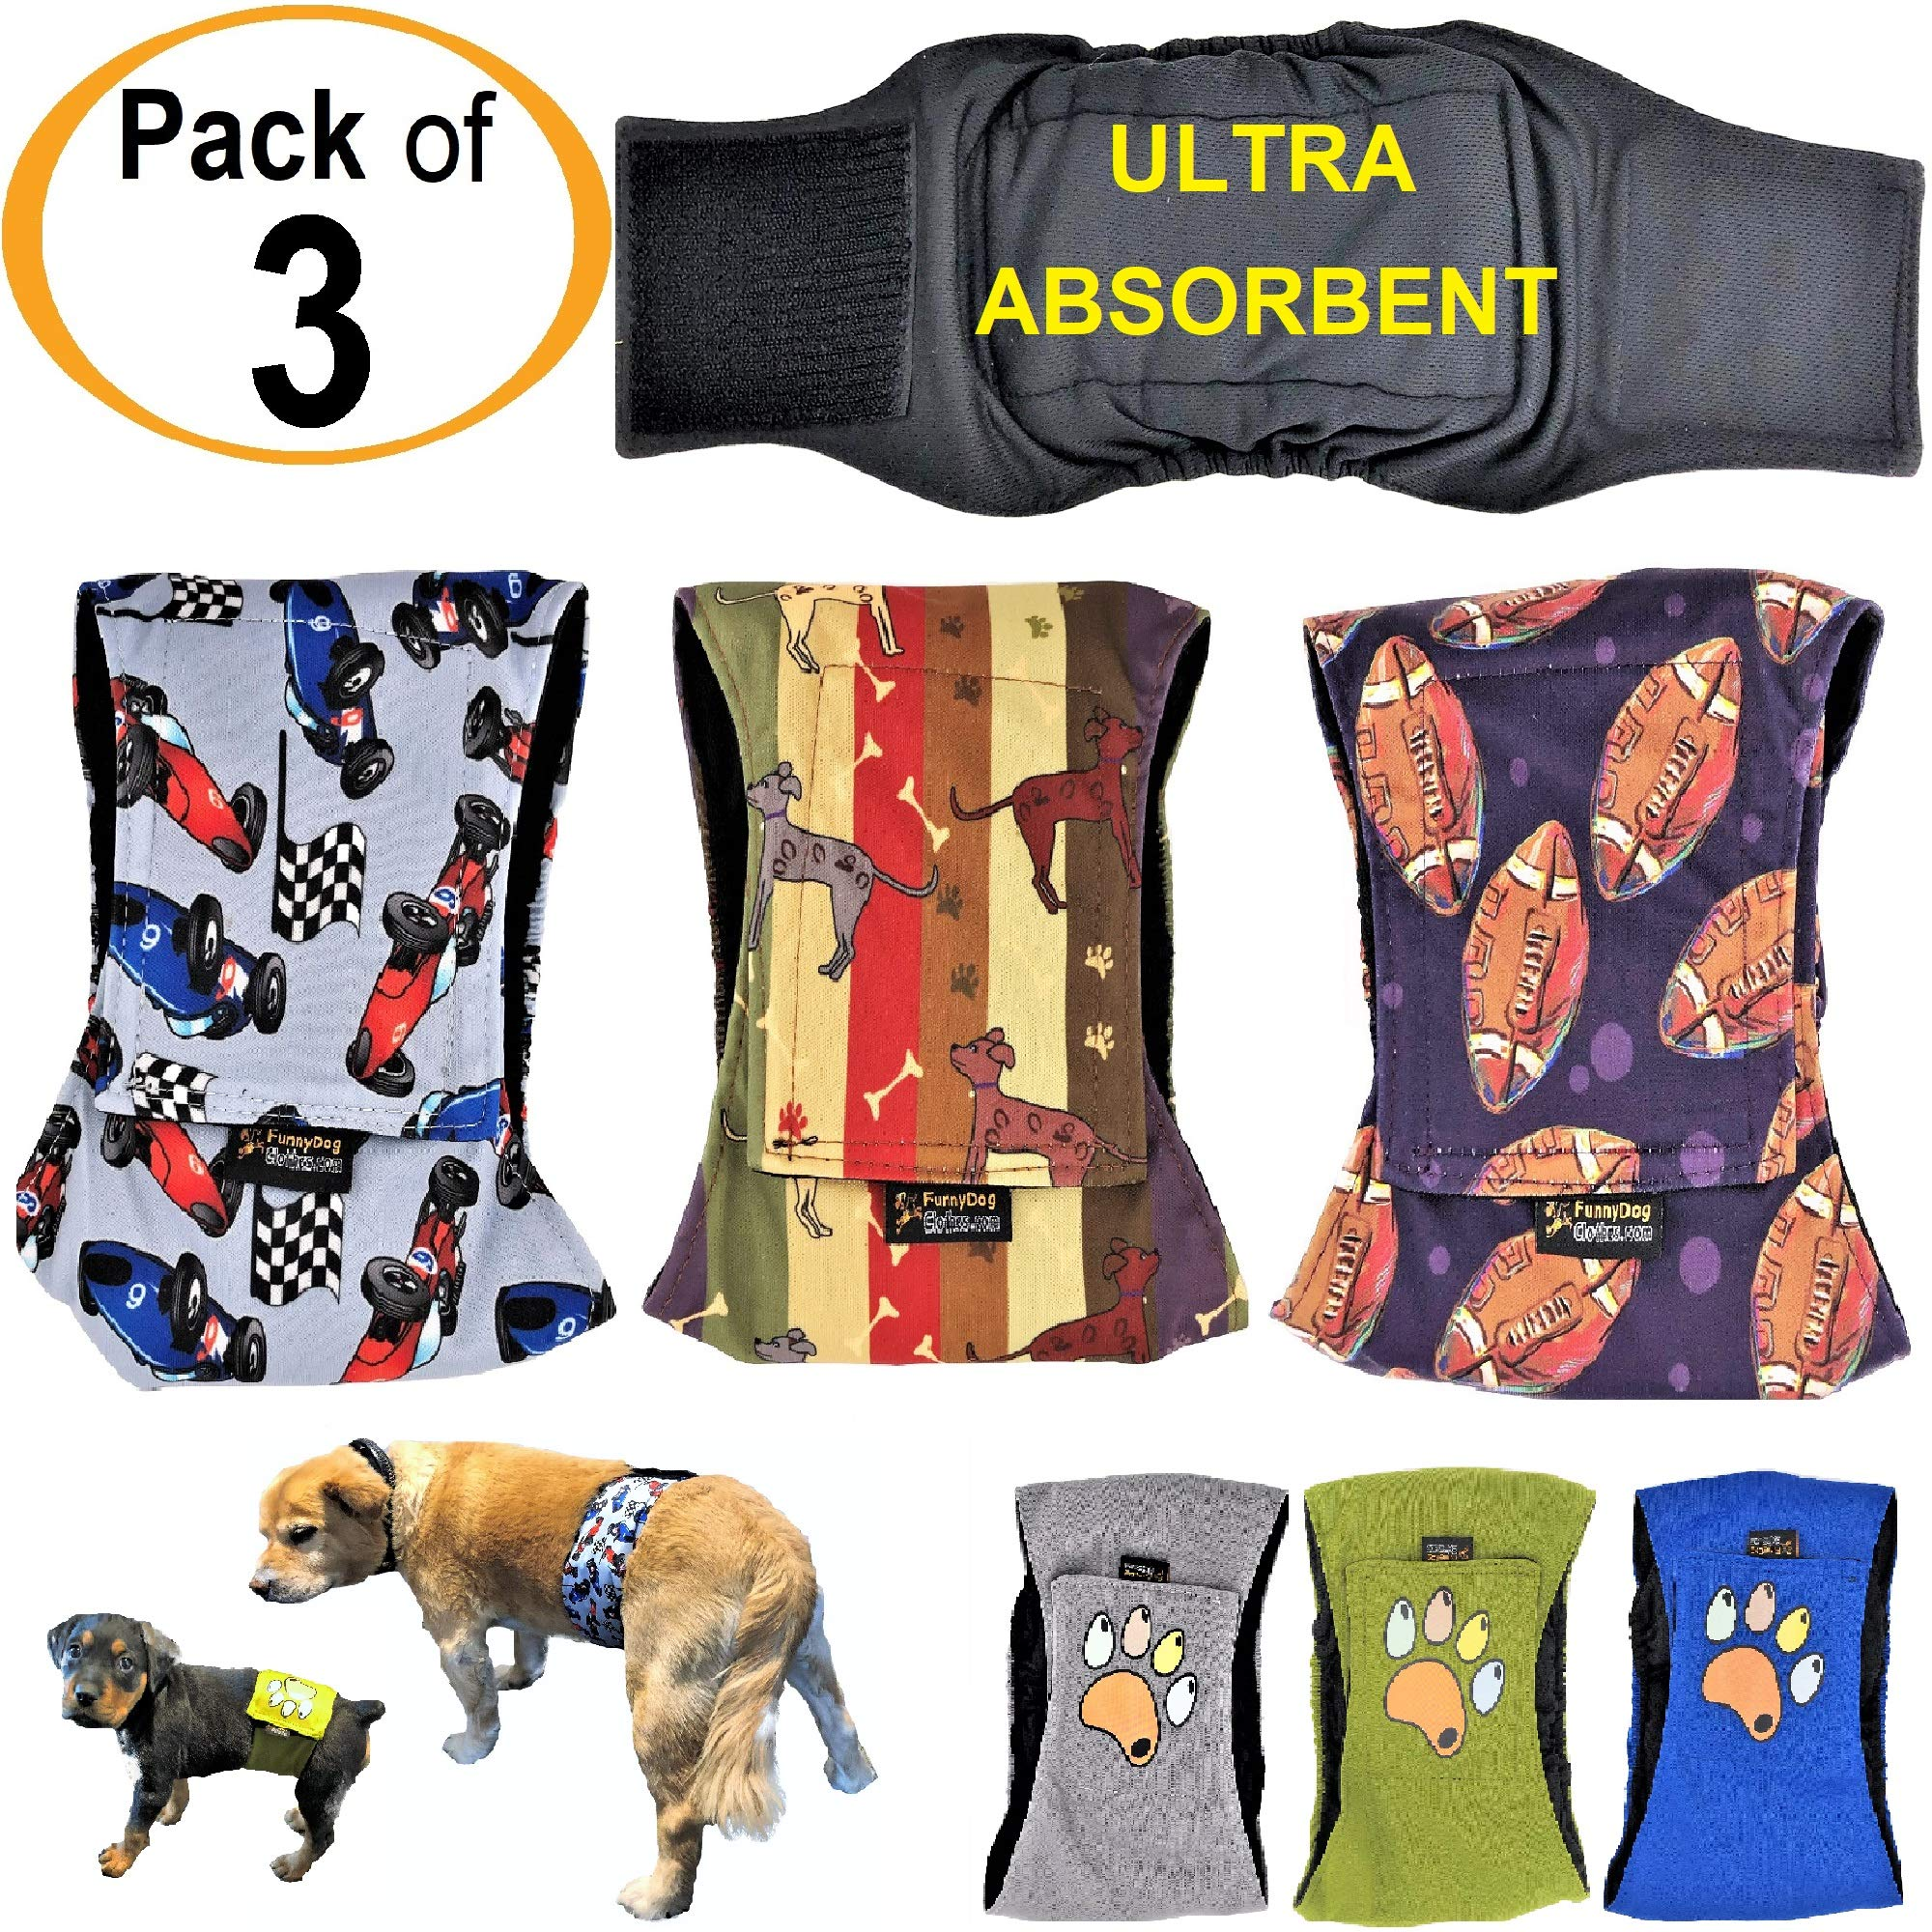 FunnyDogClothes 3 件装男式狗尿布 4 - 多层吸水垫防水防漏肚脐带可洗 图案 XL: Waist 20